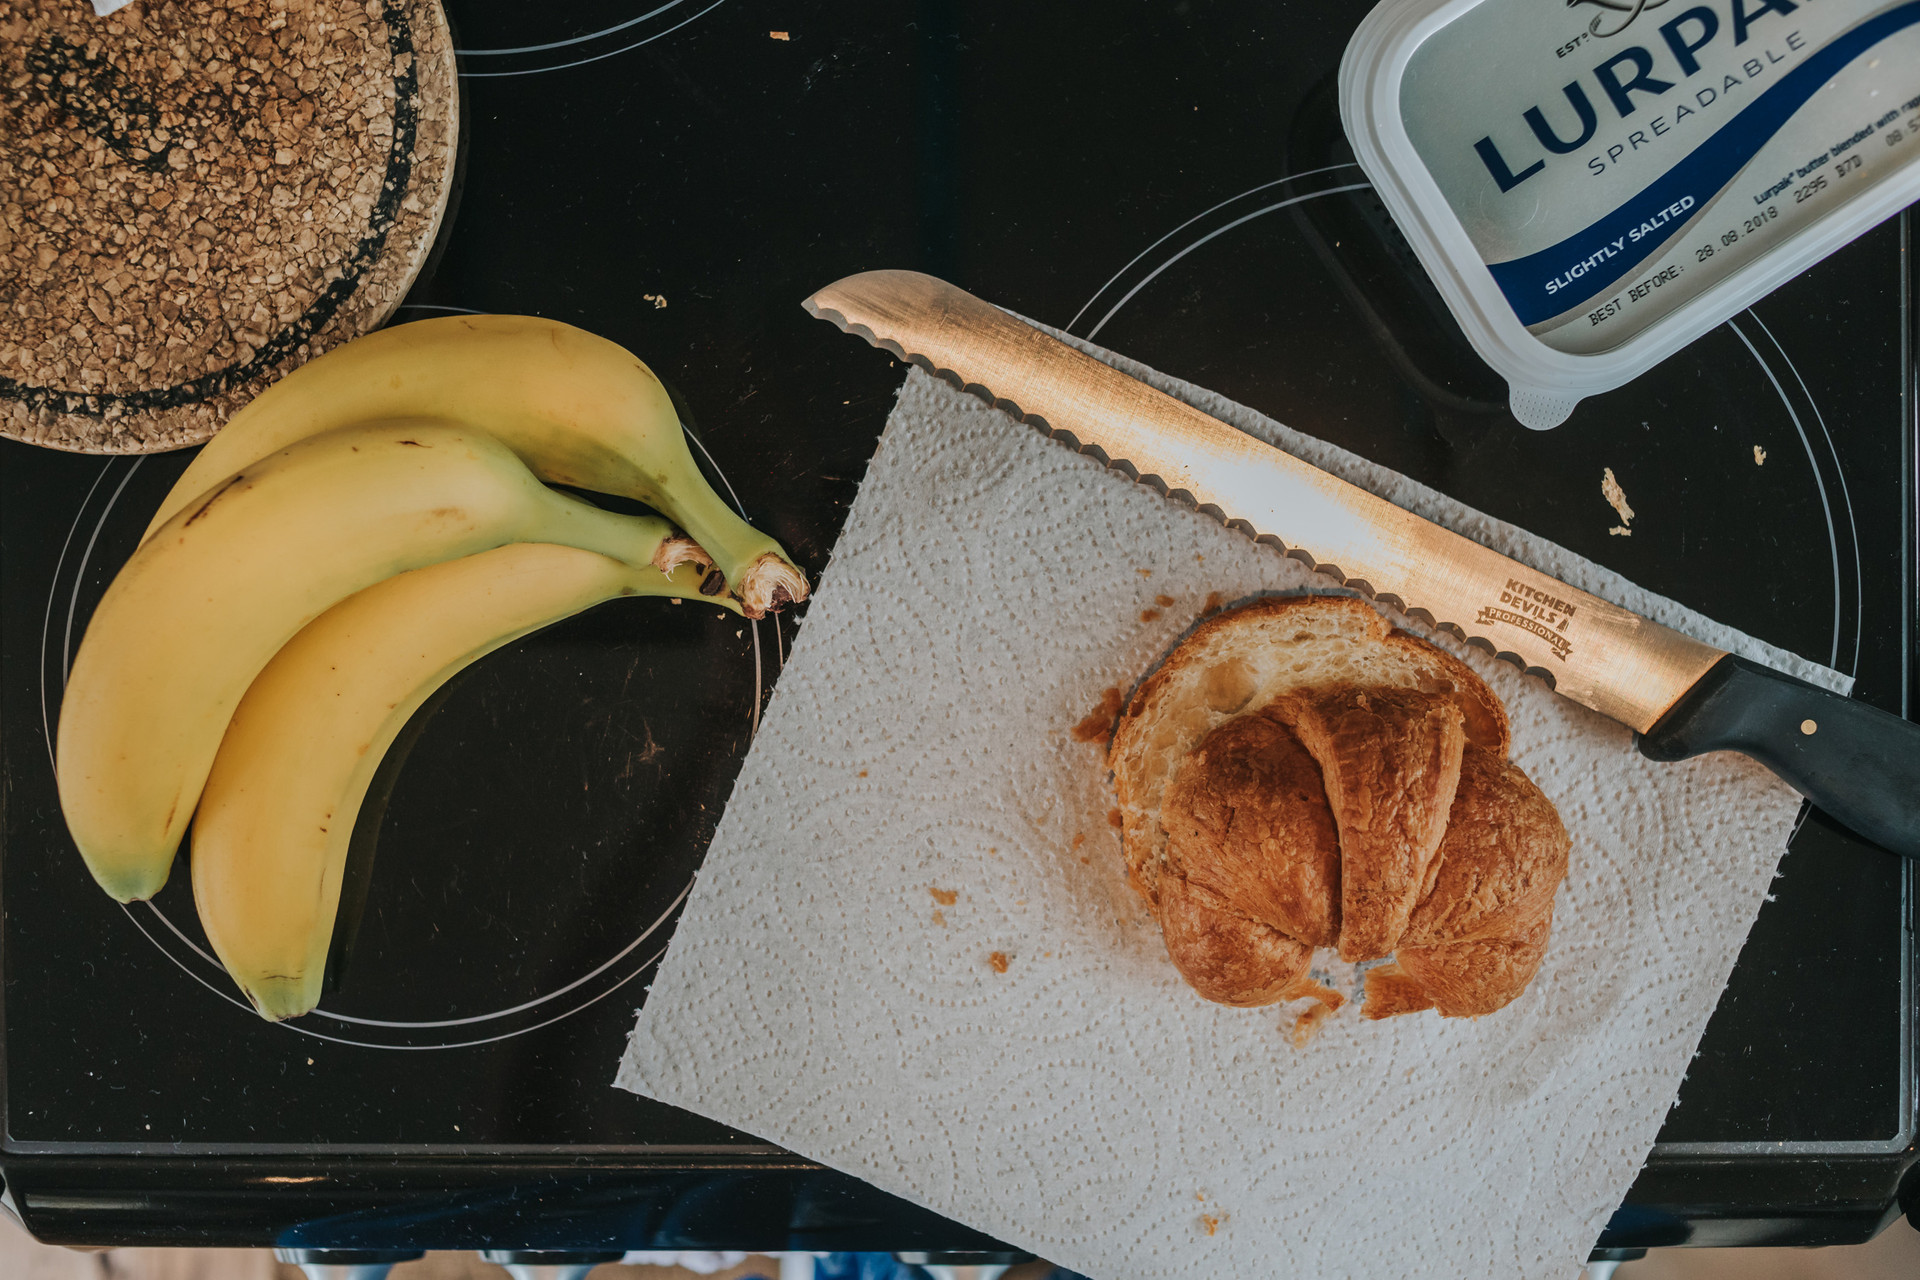 Banana and croissants for bridal prep breakfast